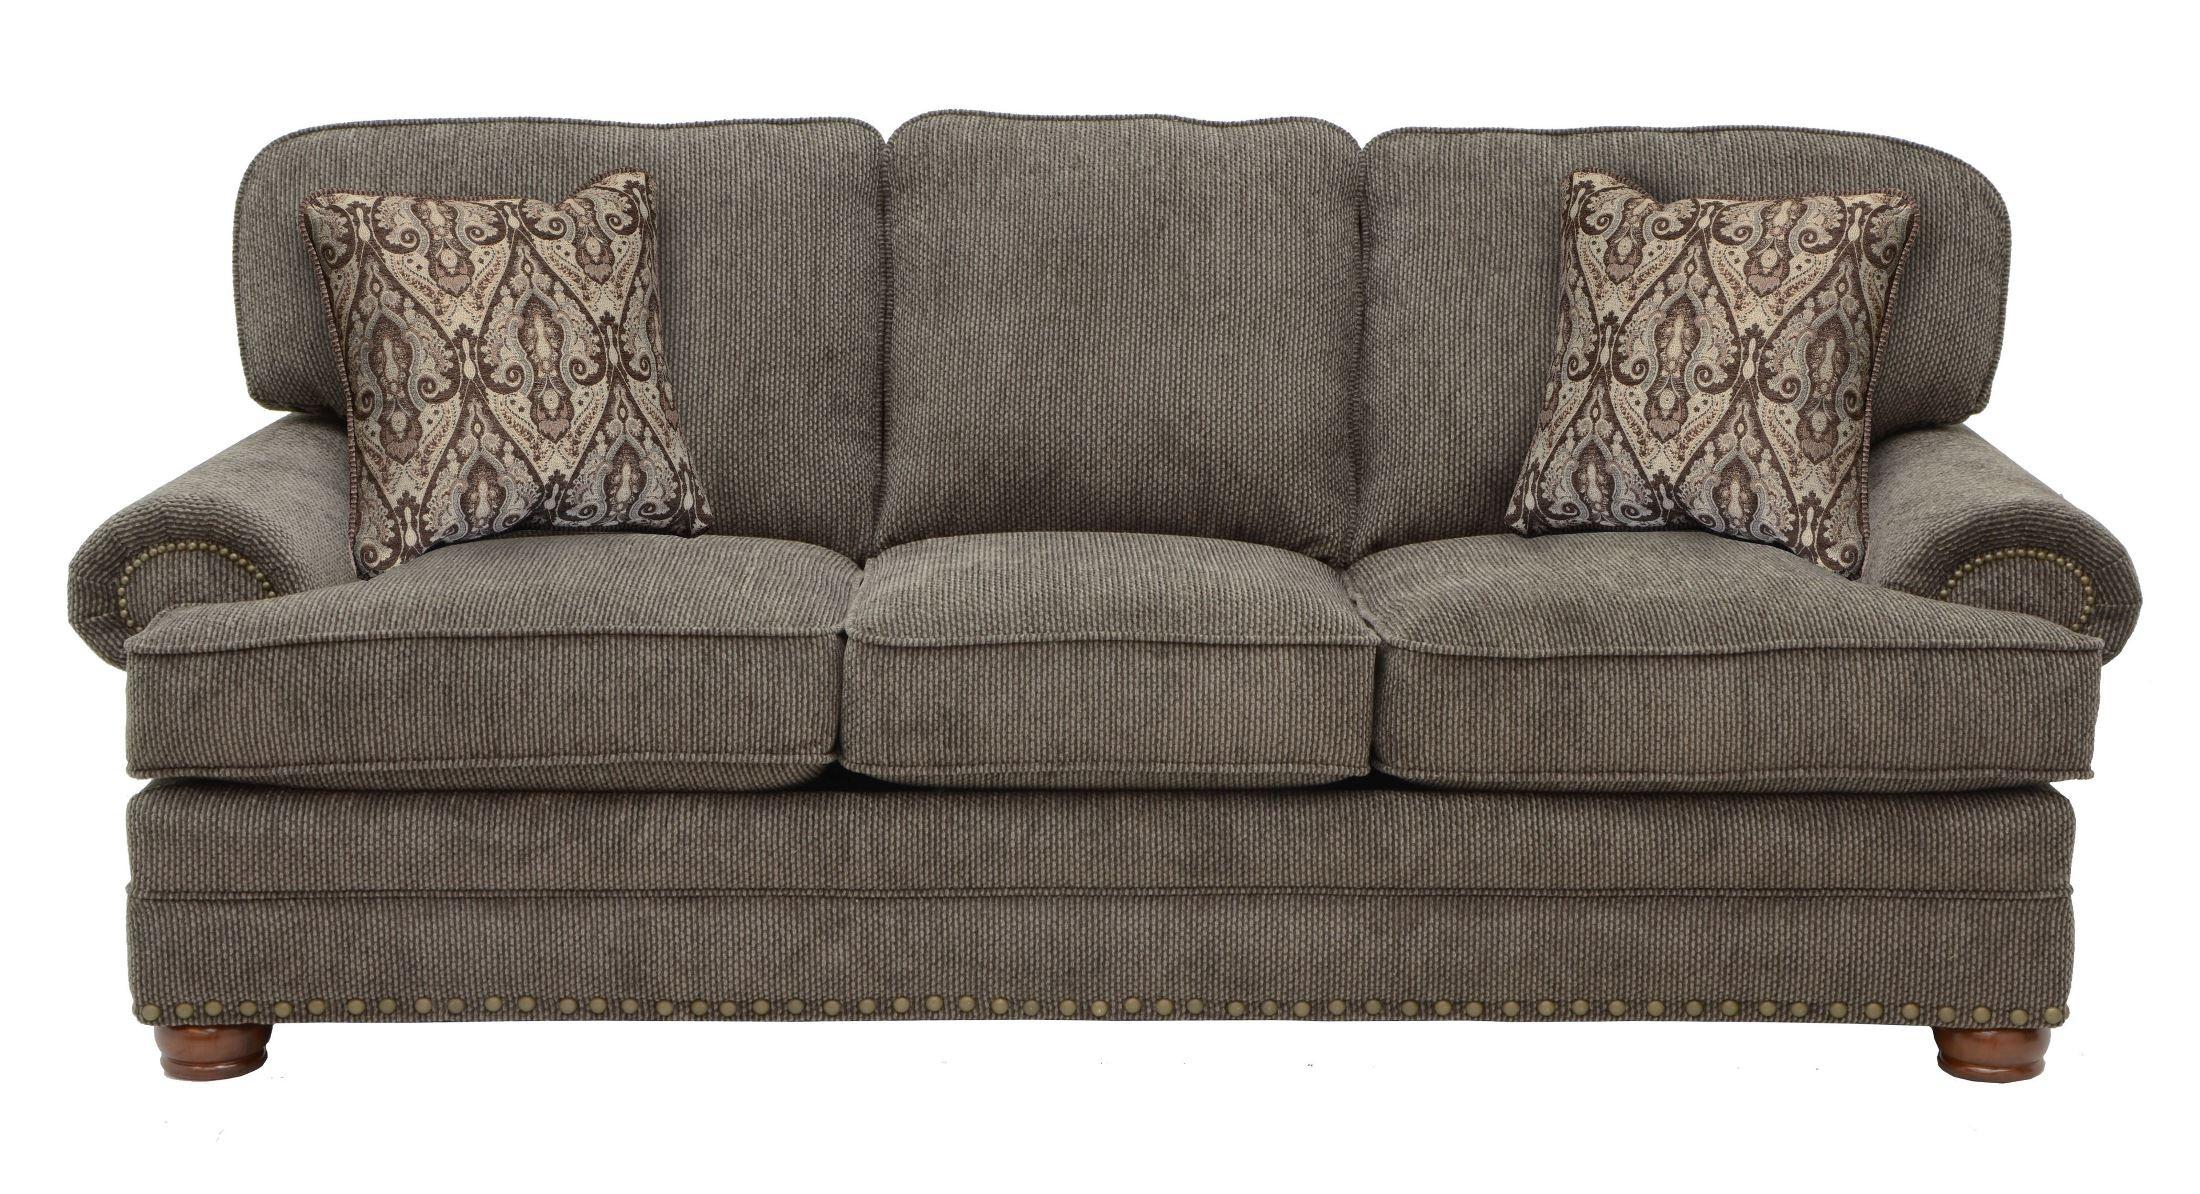 Braddock Metal Sofa From Jackson 423803000000000000 Coleman Furniture